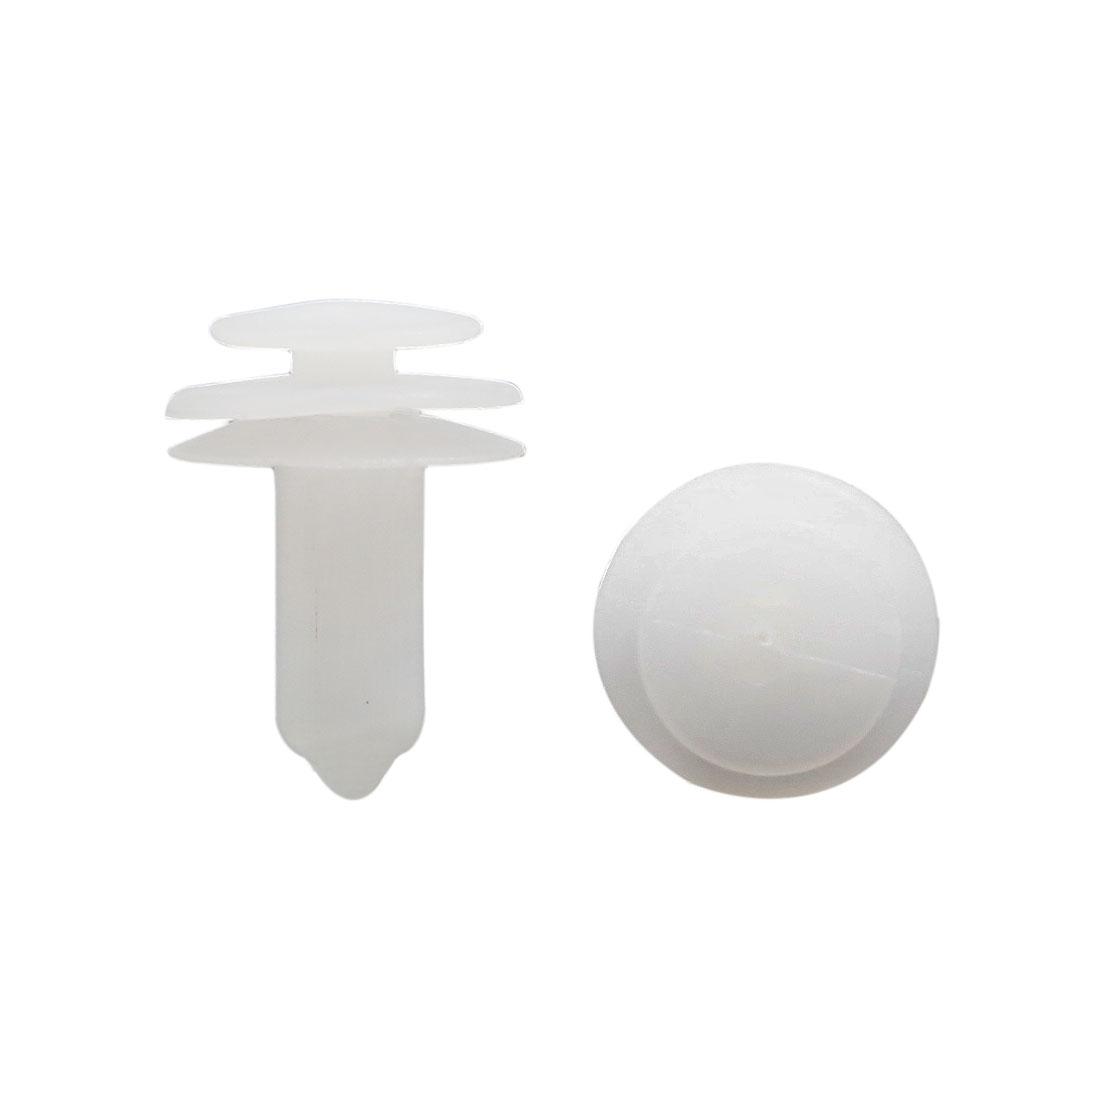 10pcs Plastic Screw Fastener Rivet Retainers Push Pin Clip for 7mm Dia Hole